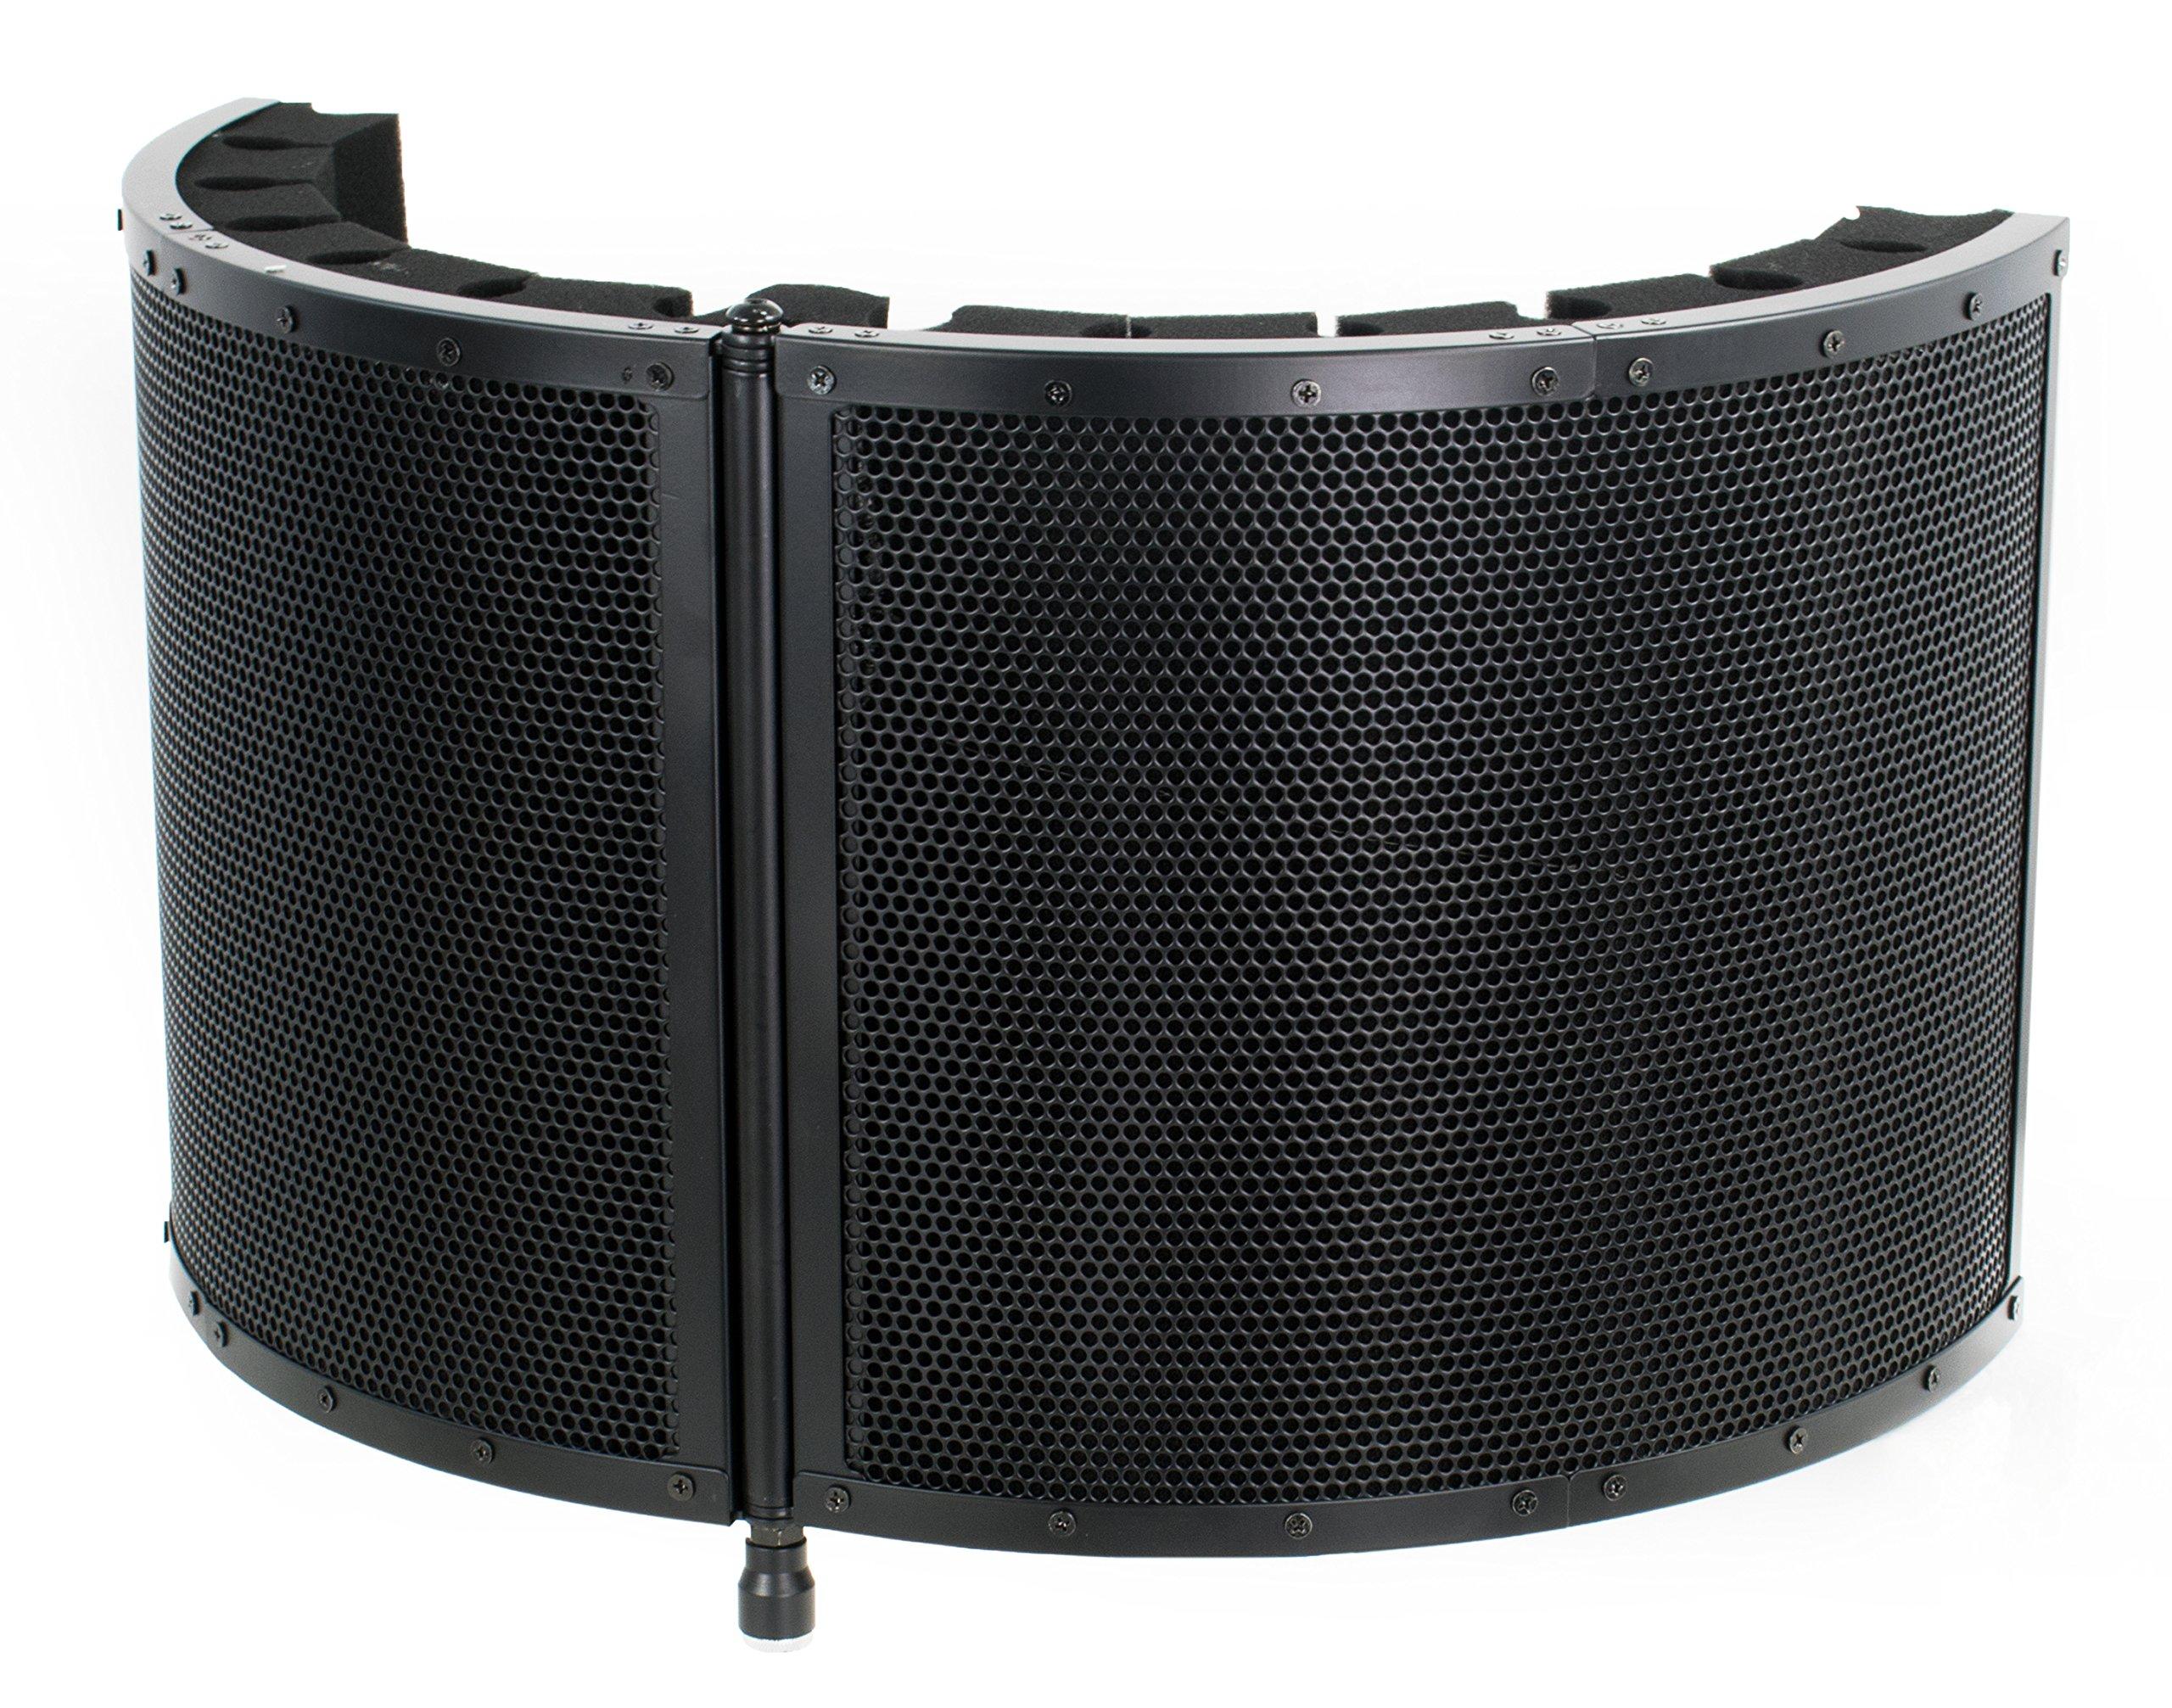 VIVO Black Universal Mini Portable Vocal Recording Booth Audio Isolation Noise Foam Sound Folding Panel Shield (VB-01) by VIVO